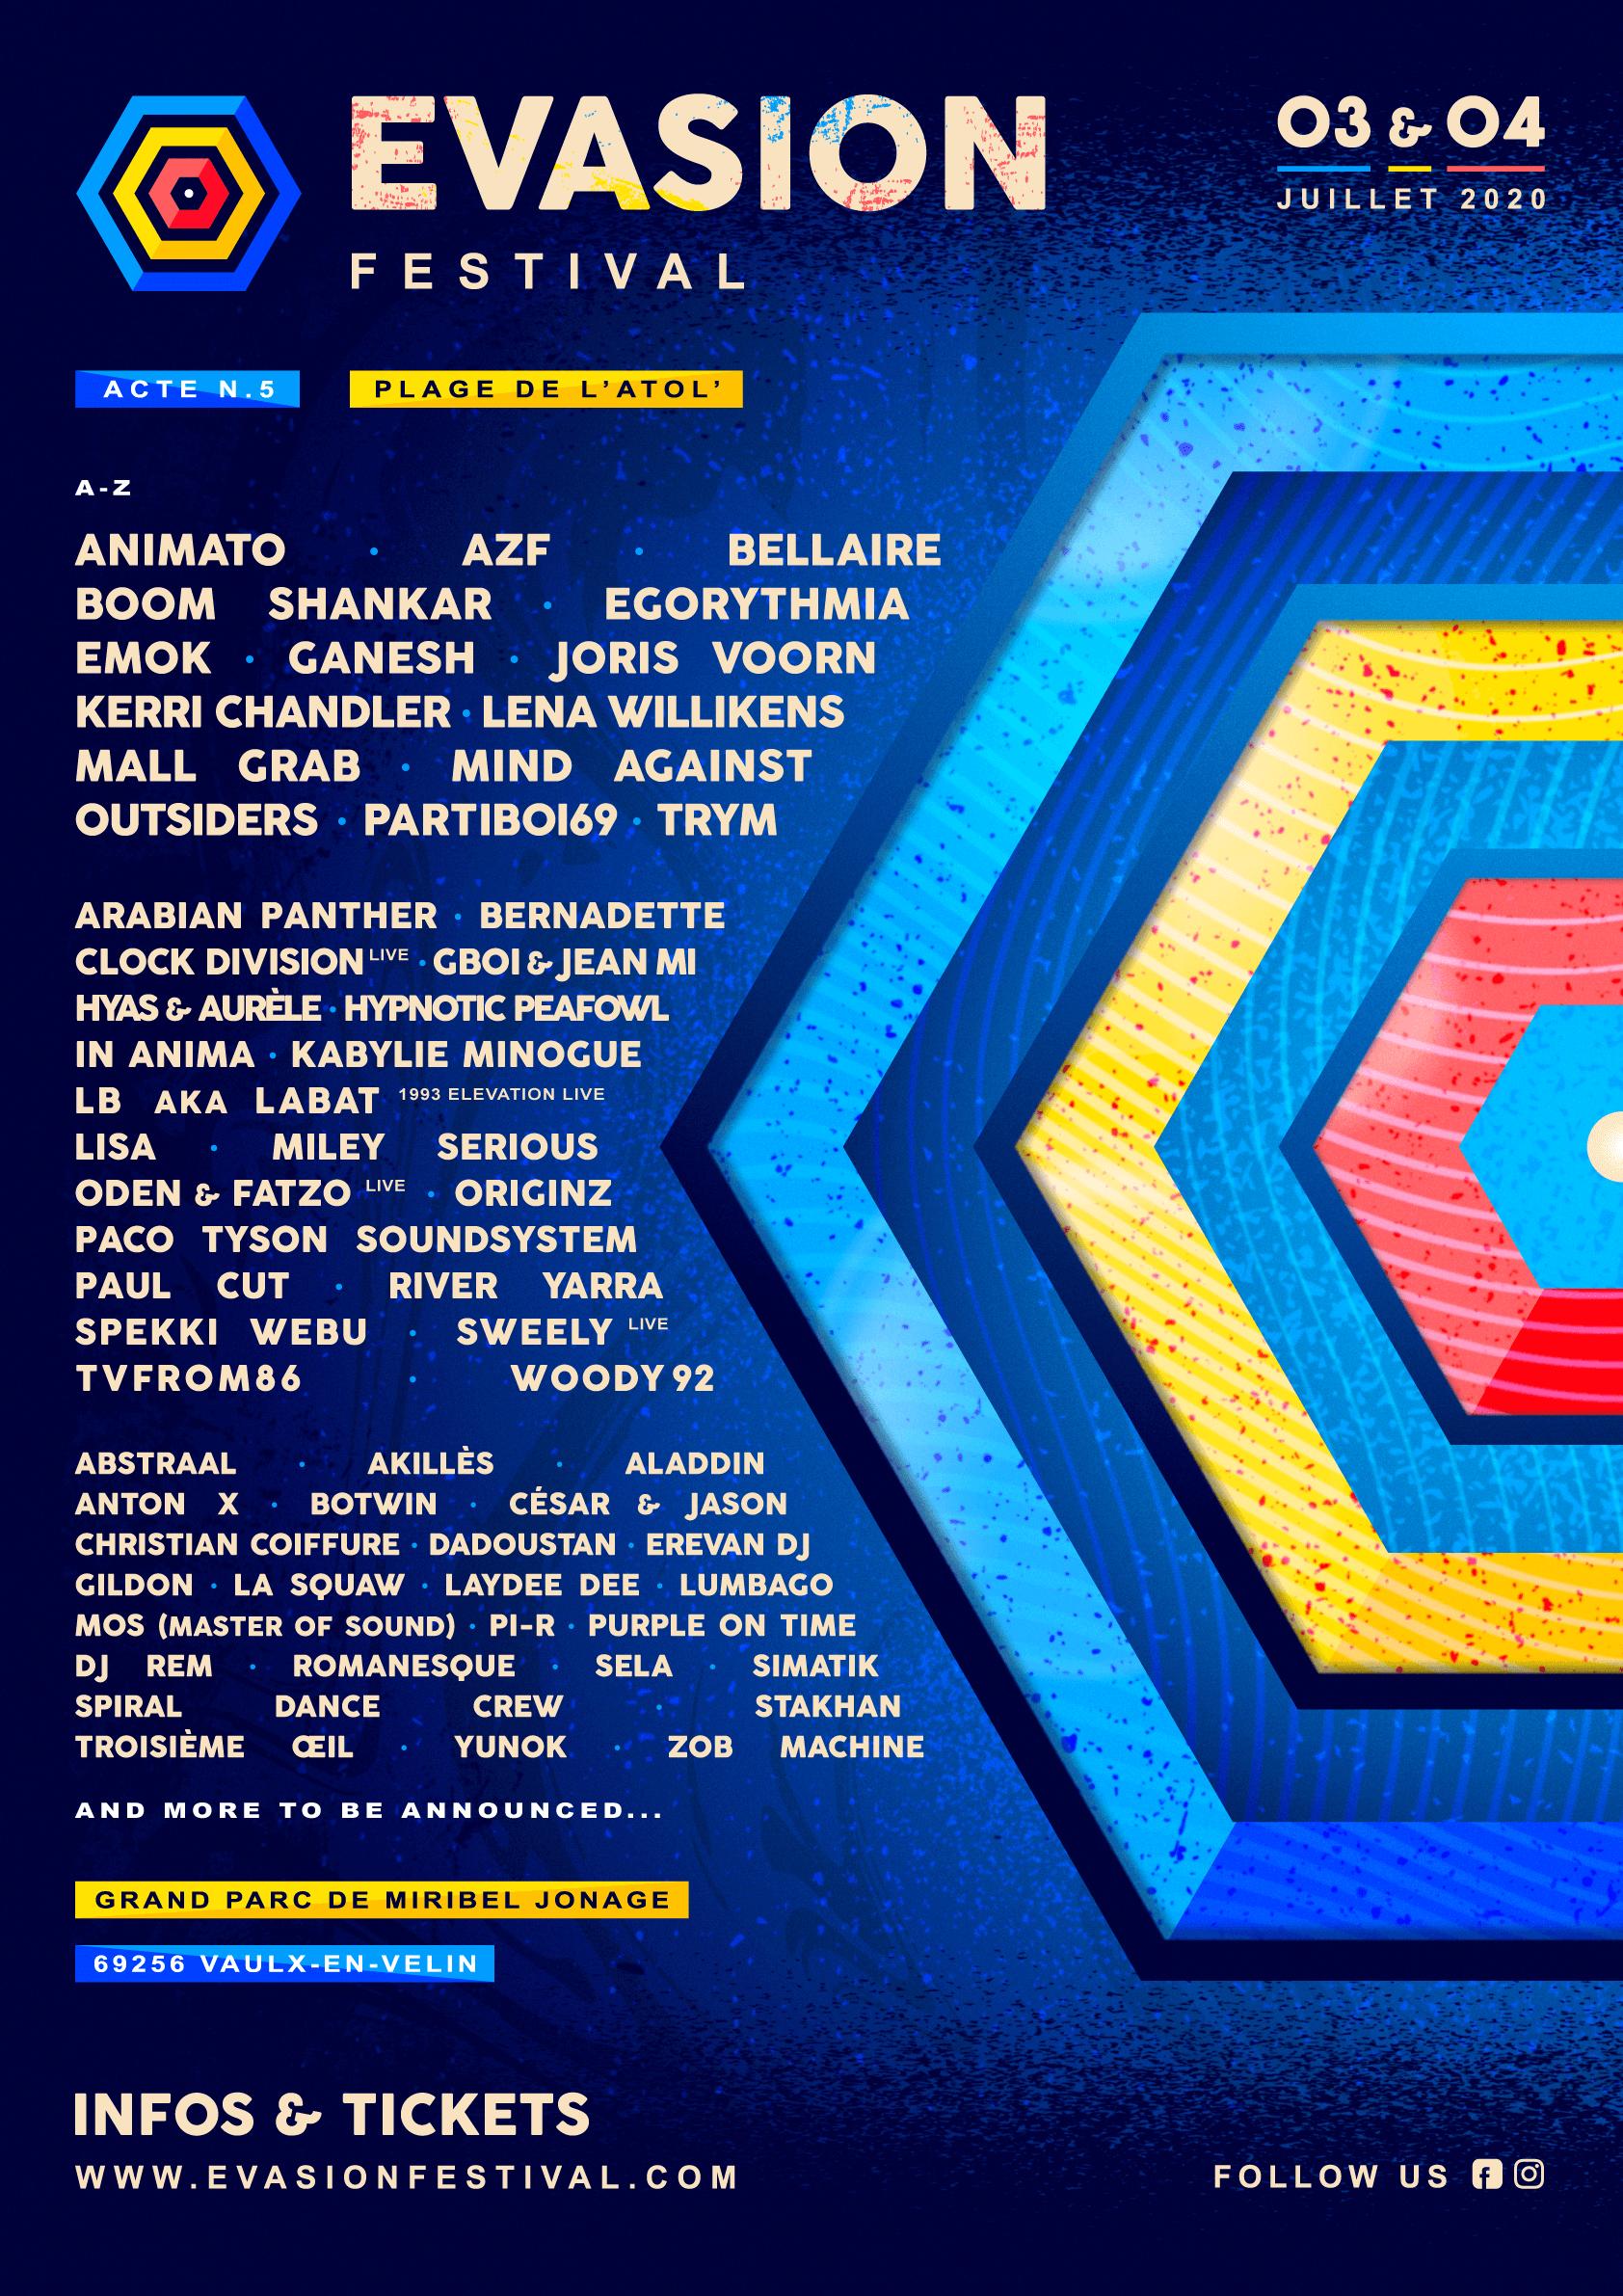 Affiche Evasion Festival 2020